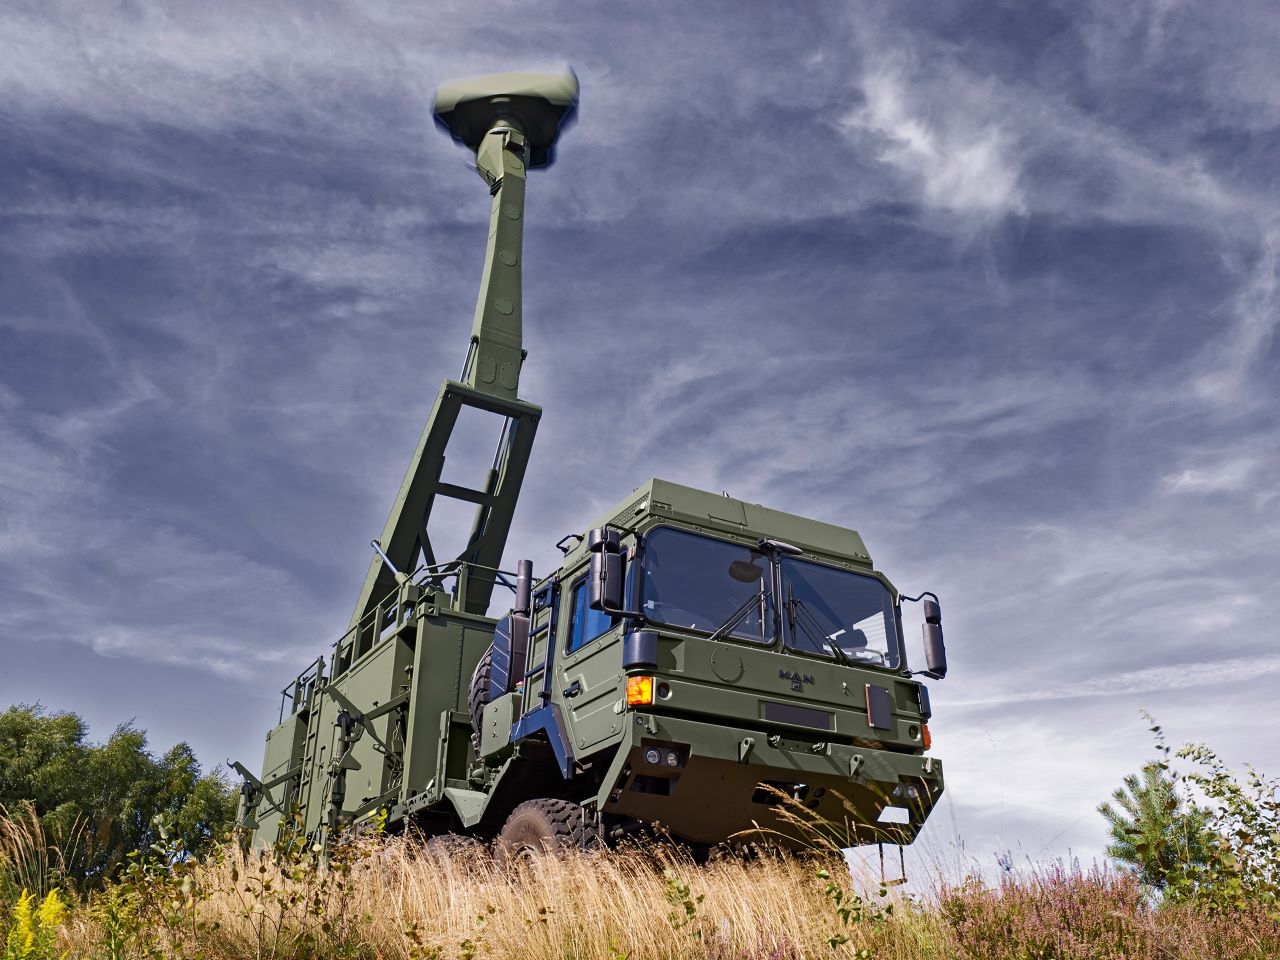 Saab Giraffe AMB (Agile Multi Beam) radar systems